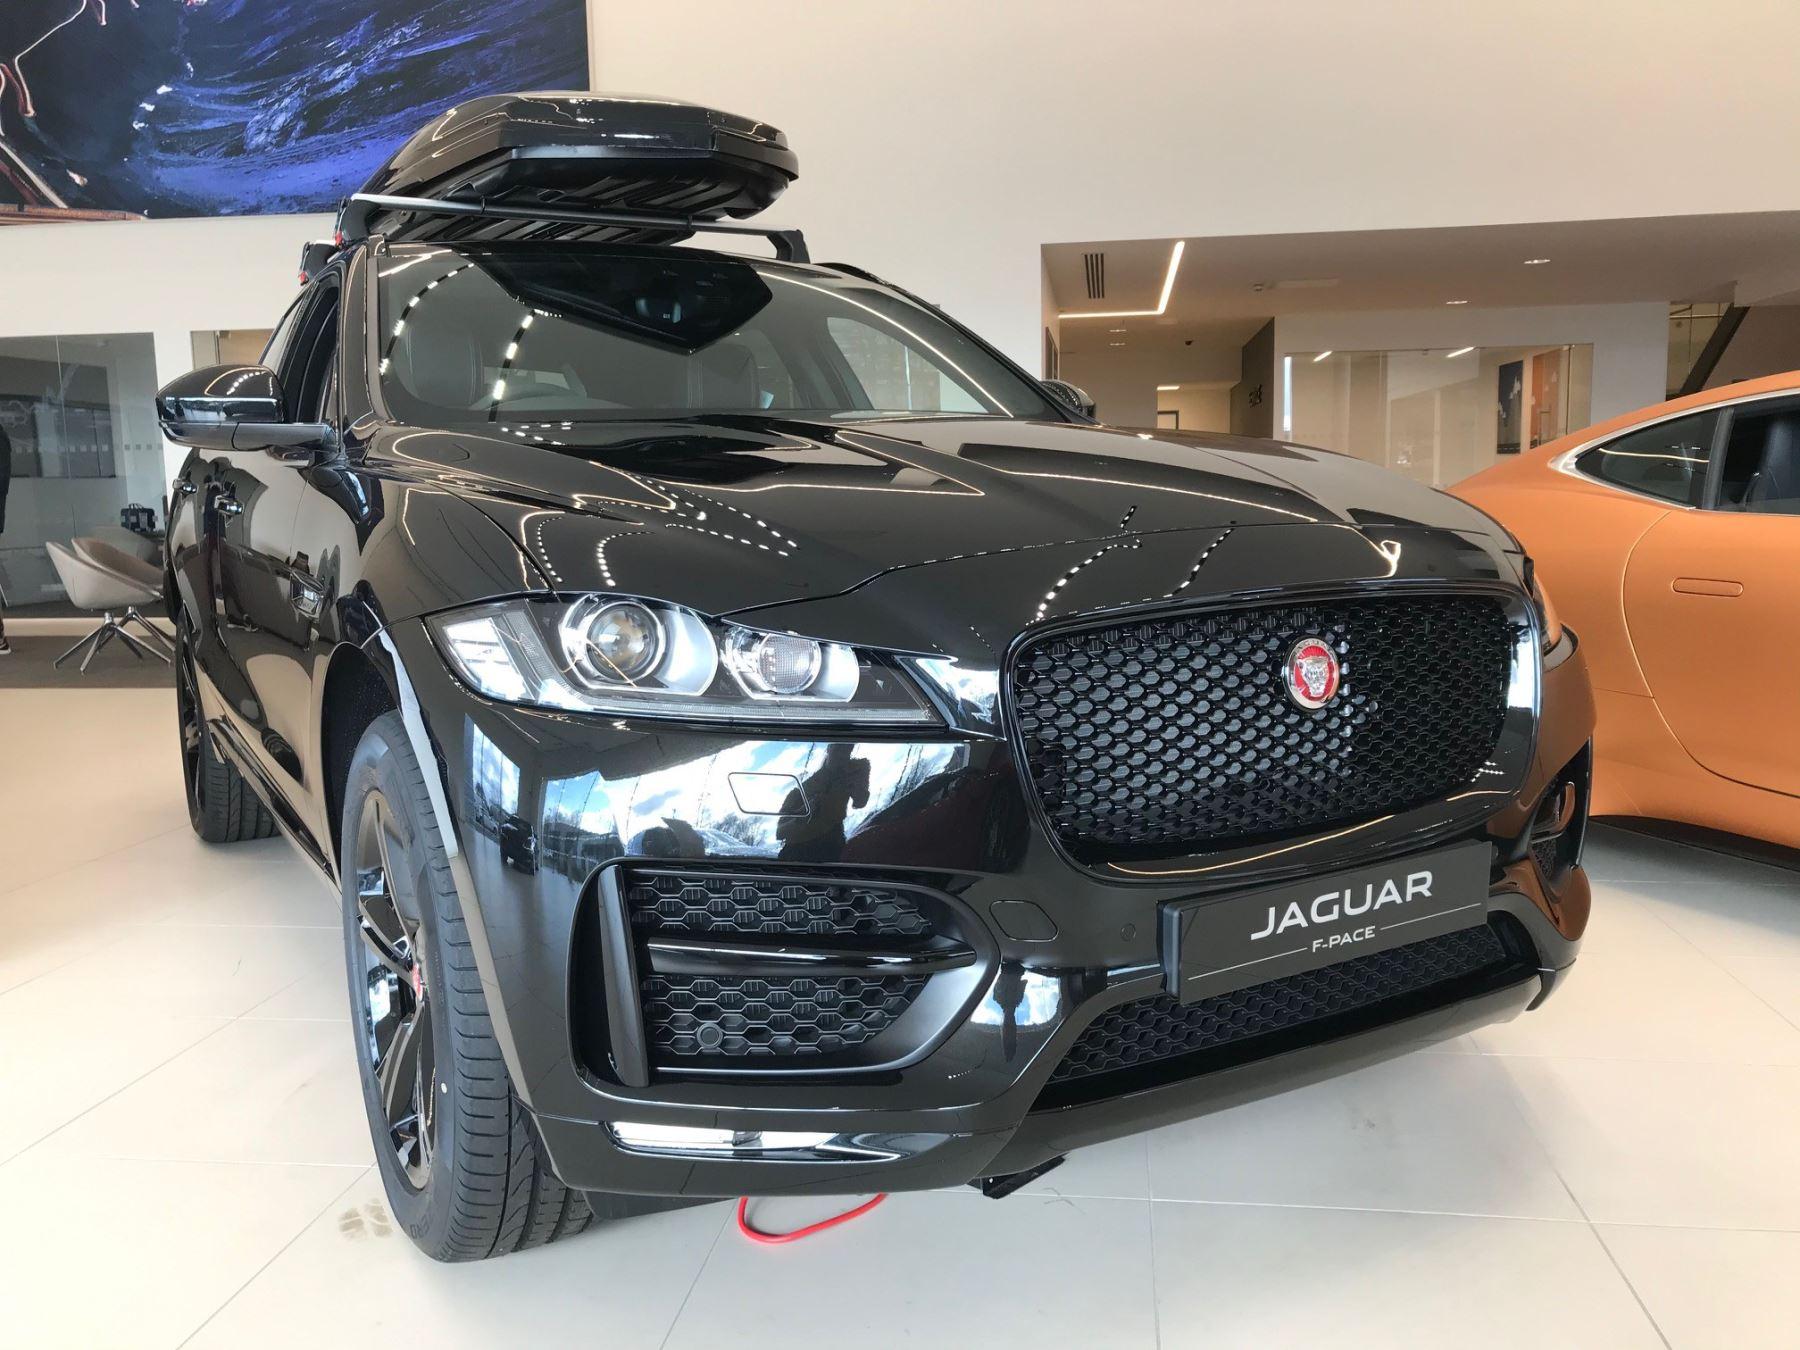 Jaguar F-PACE 2.0 R-Sport AWD Automatic 5 door Estate (17MY)